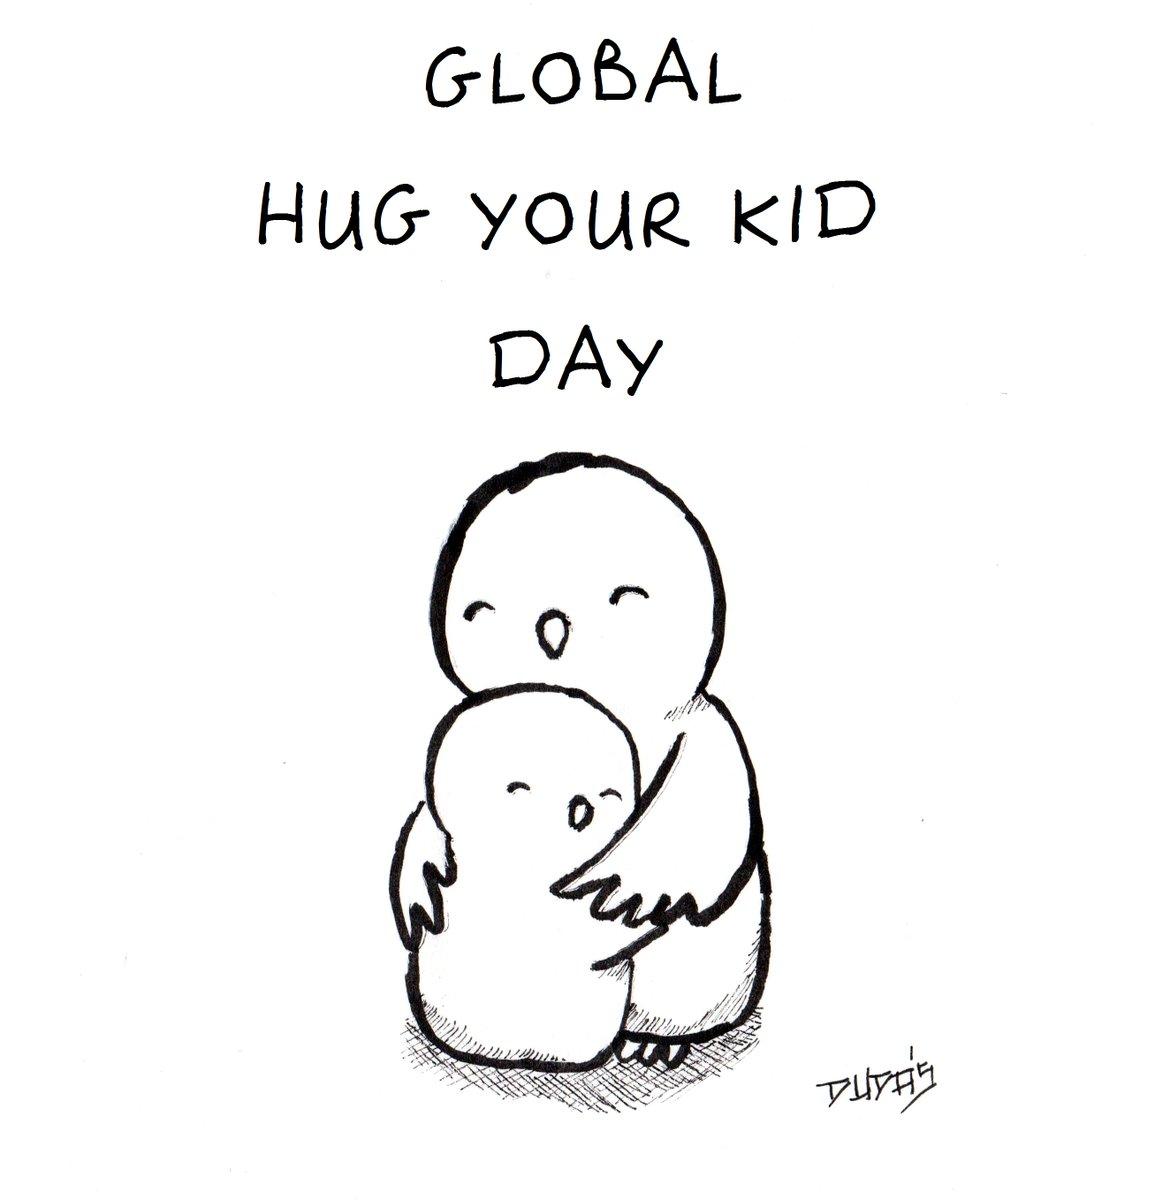 e3c9fb91c0ec Global hug your kid day animal bird blackandwhite child children cute  drawing jpg 1155x1200 Child cute